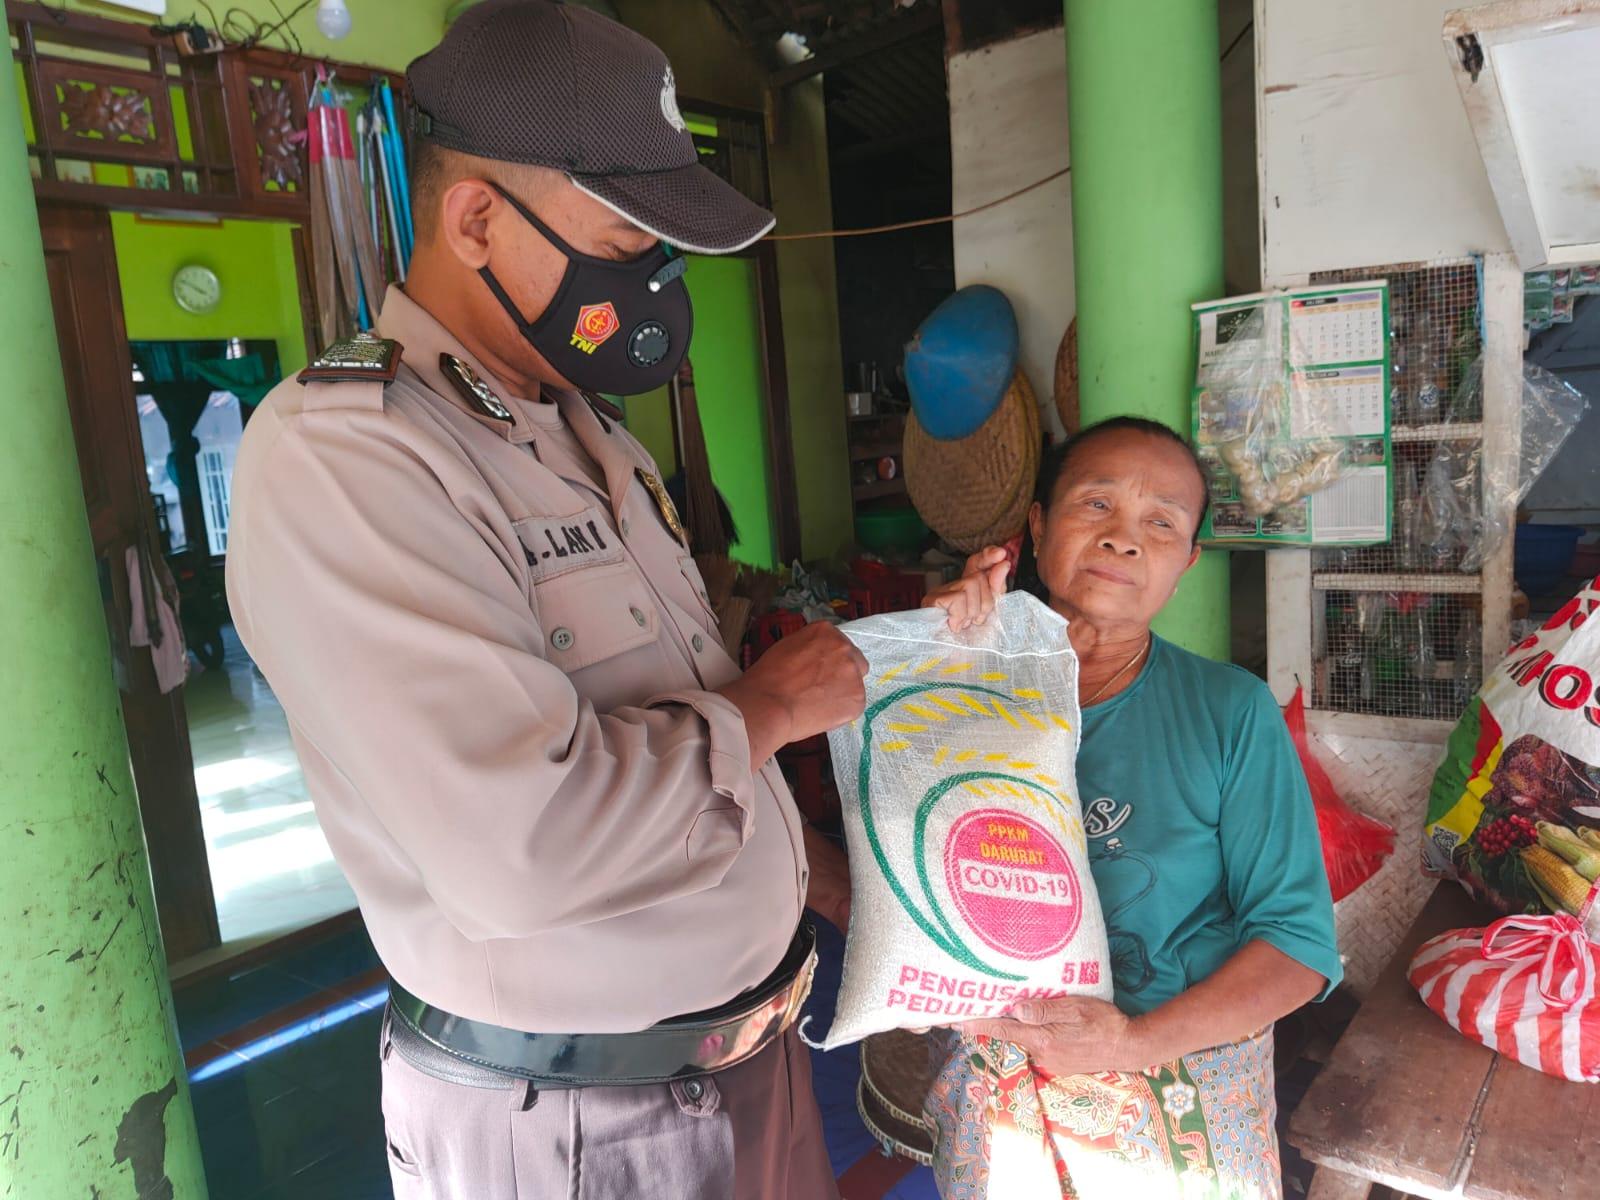 Polresta Cirebon Peduli menyasar ke Warga Desa Japura Lor dan Japura Kidul